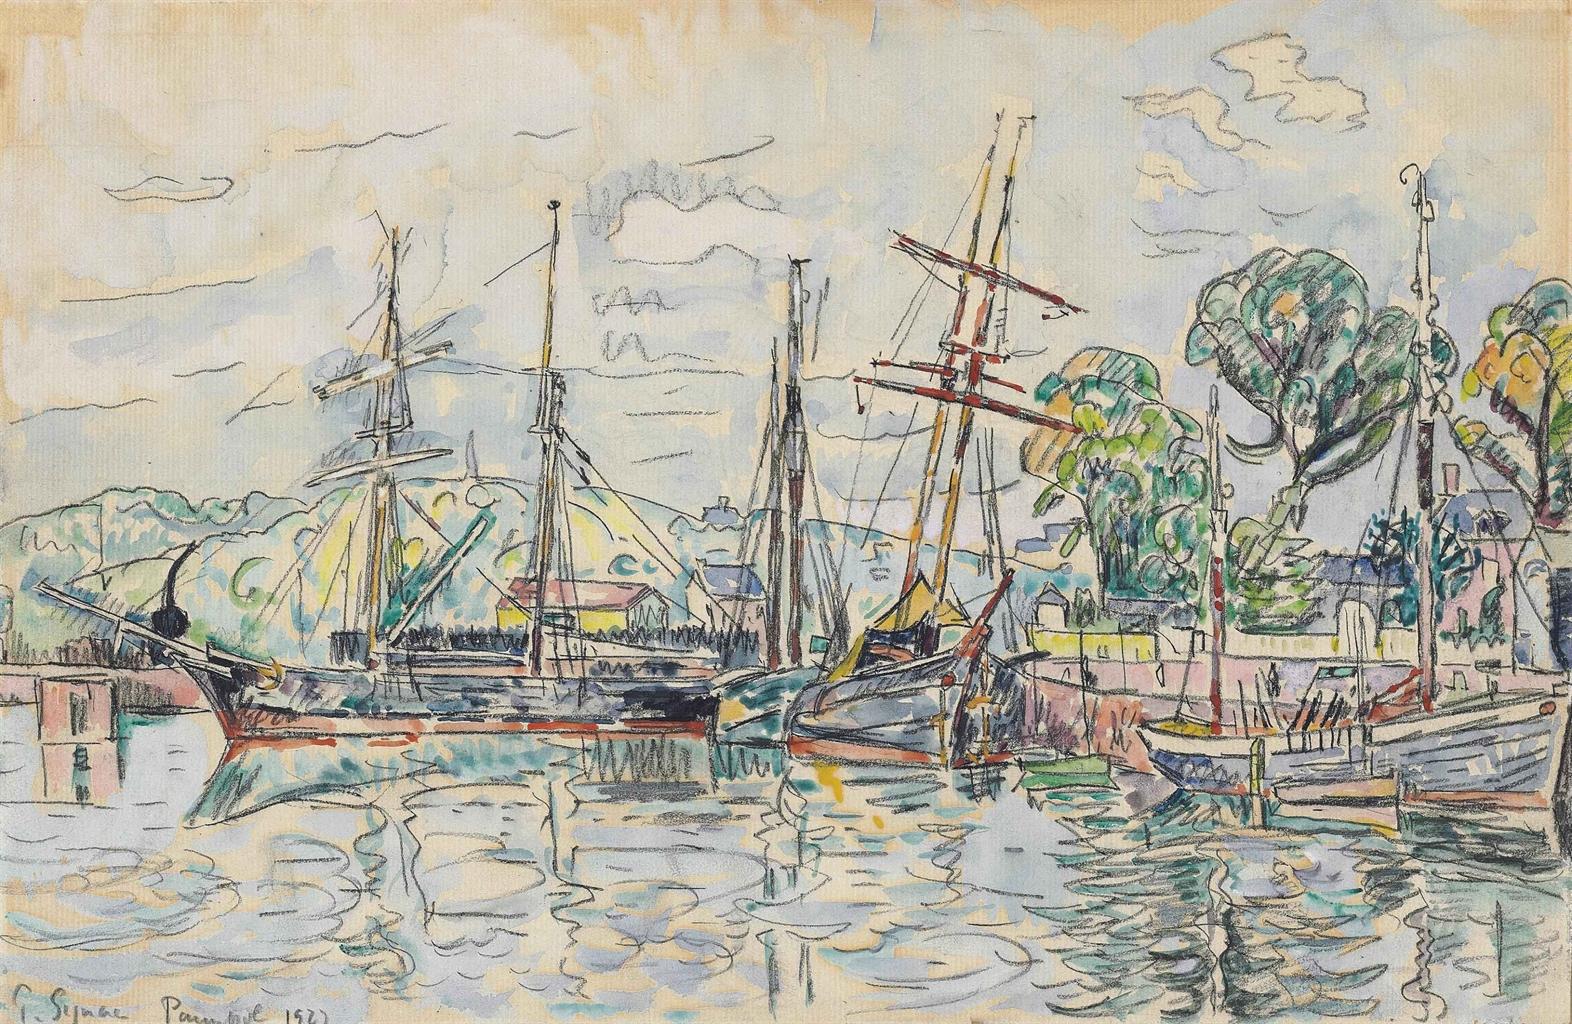 Paul Signac-Paimpol, Terre-Neuvas a quai-1927